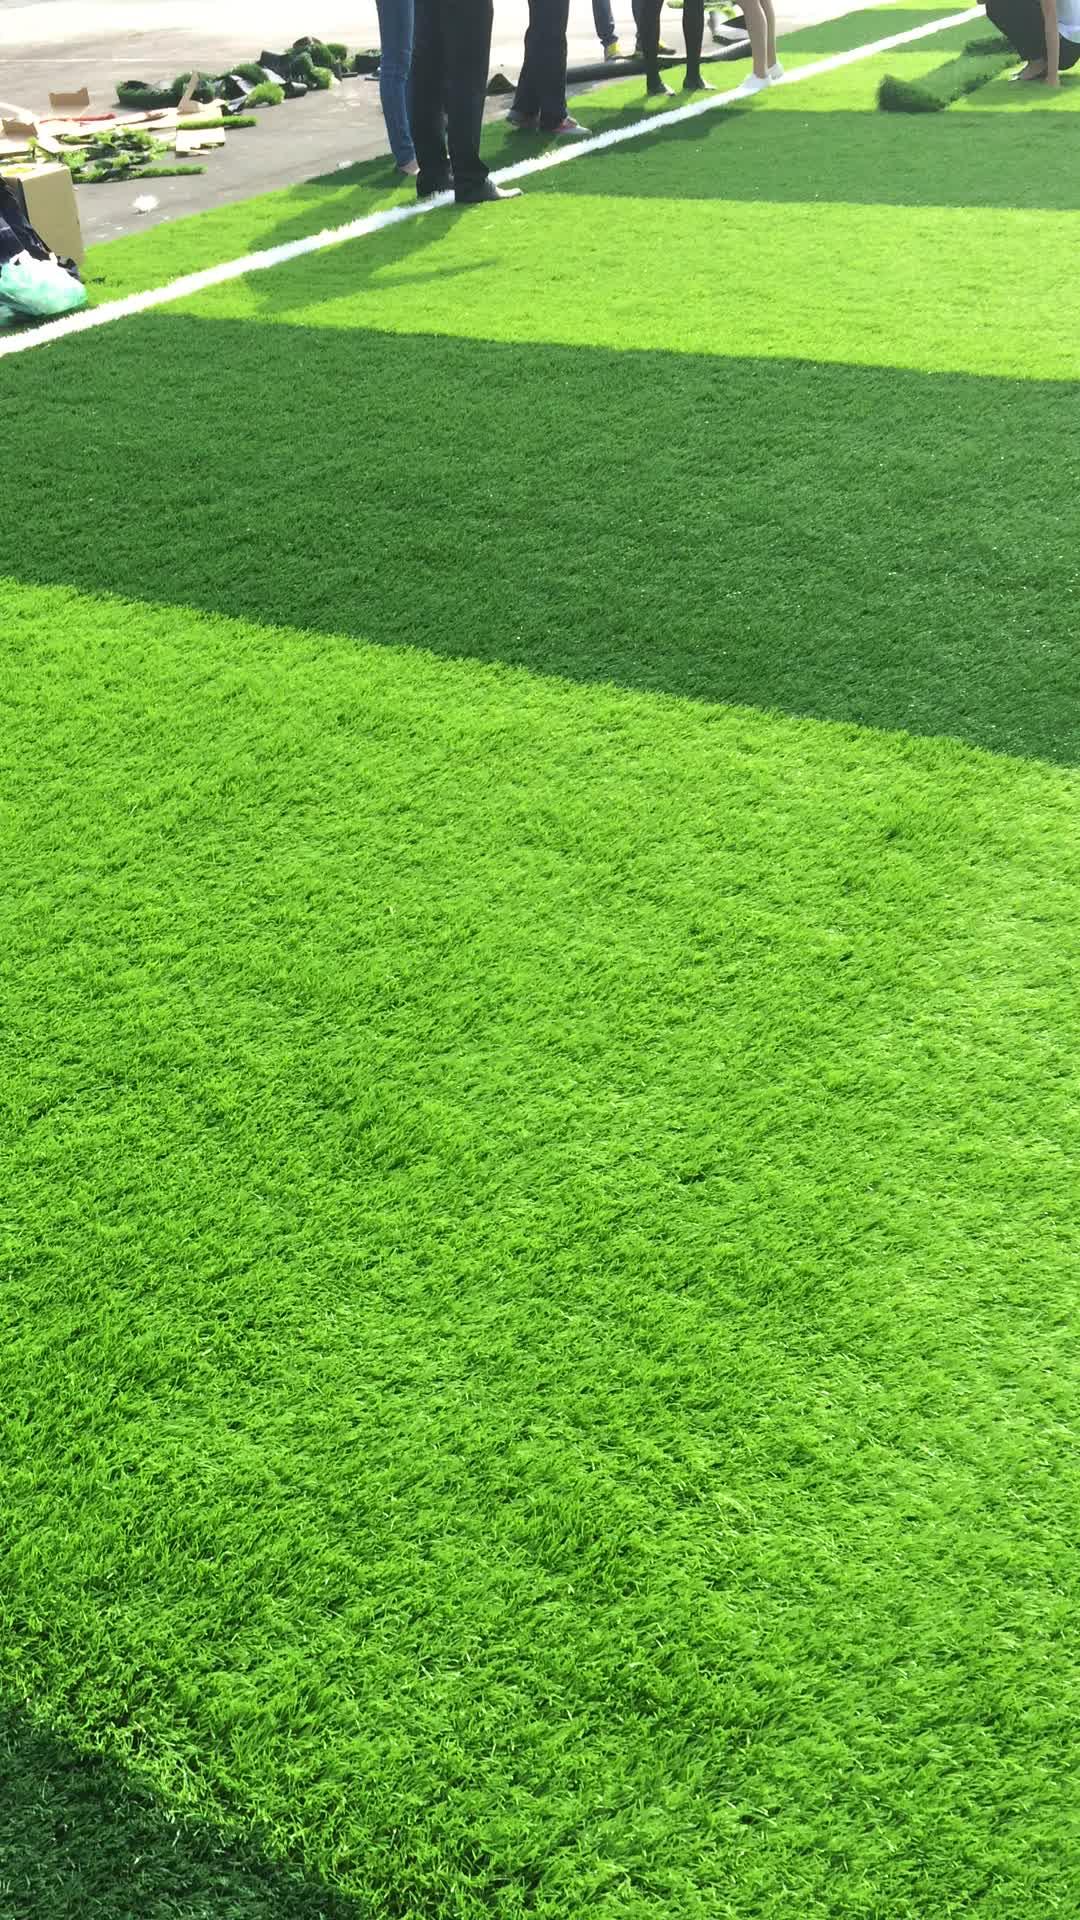 football field lawn,mini outdoor football grass carpet G014